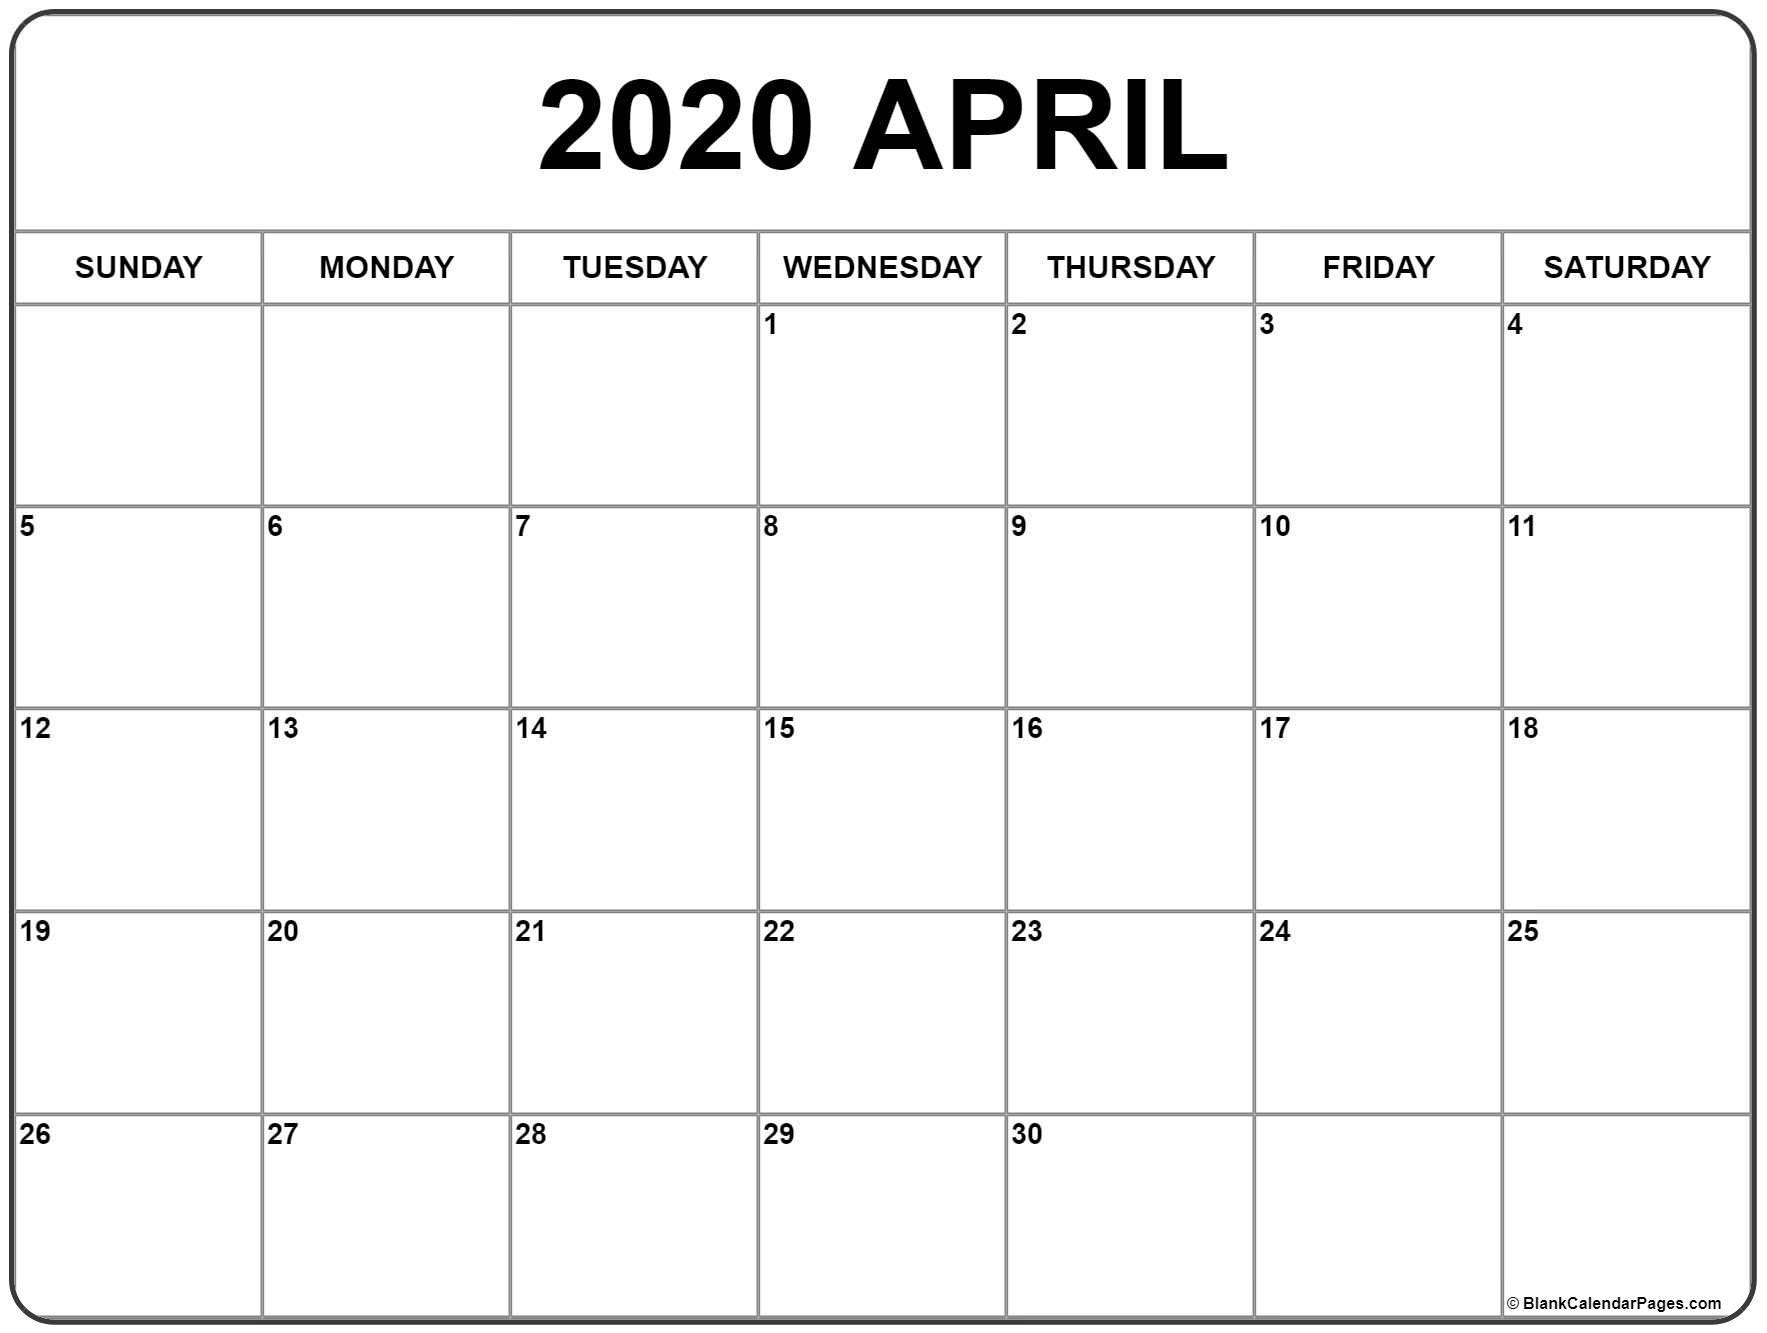 April 2020 Calendar | Free Printable Monthly Calendars for National Day Calendar 2020 Printable